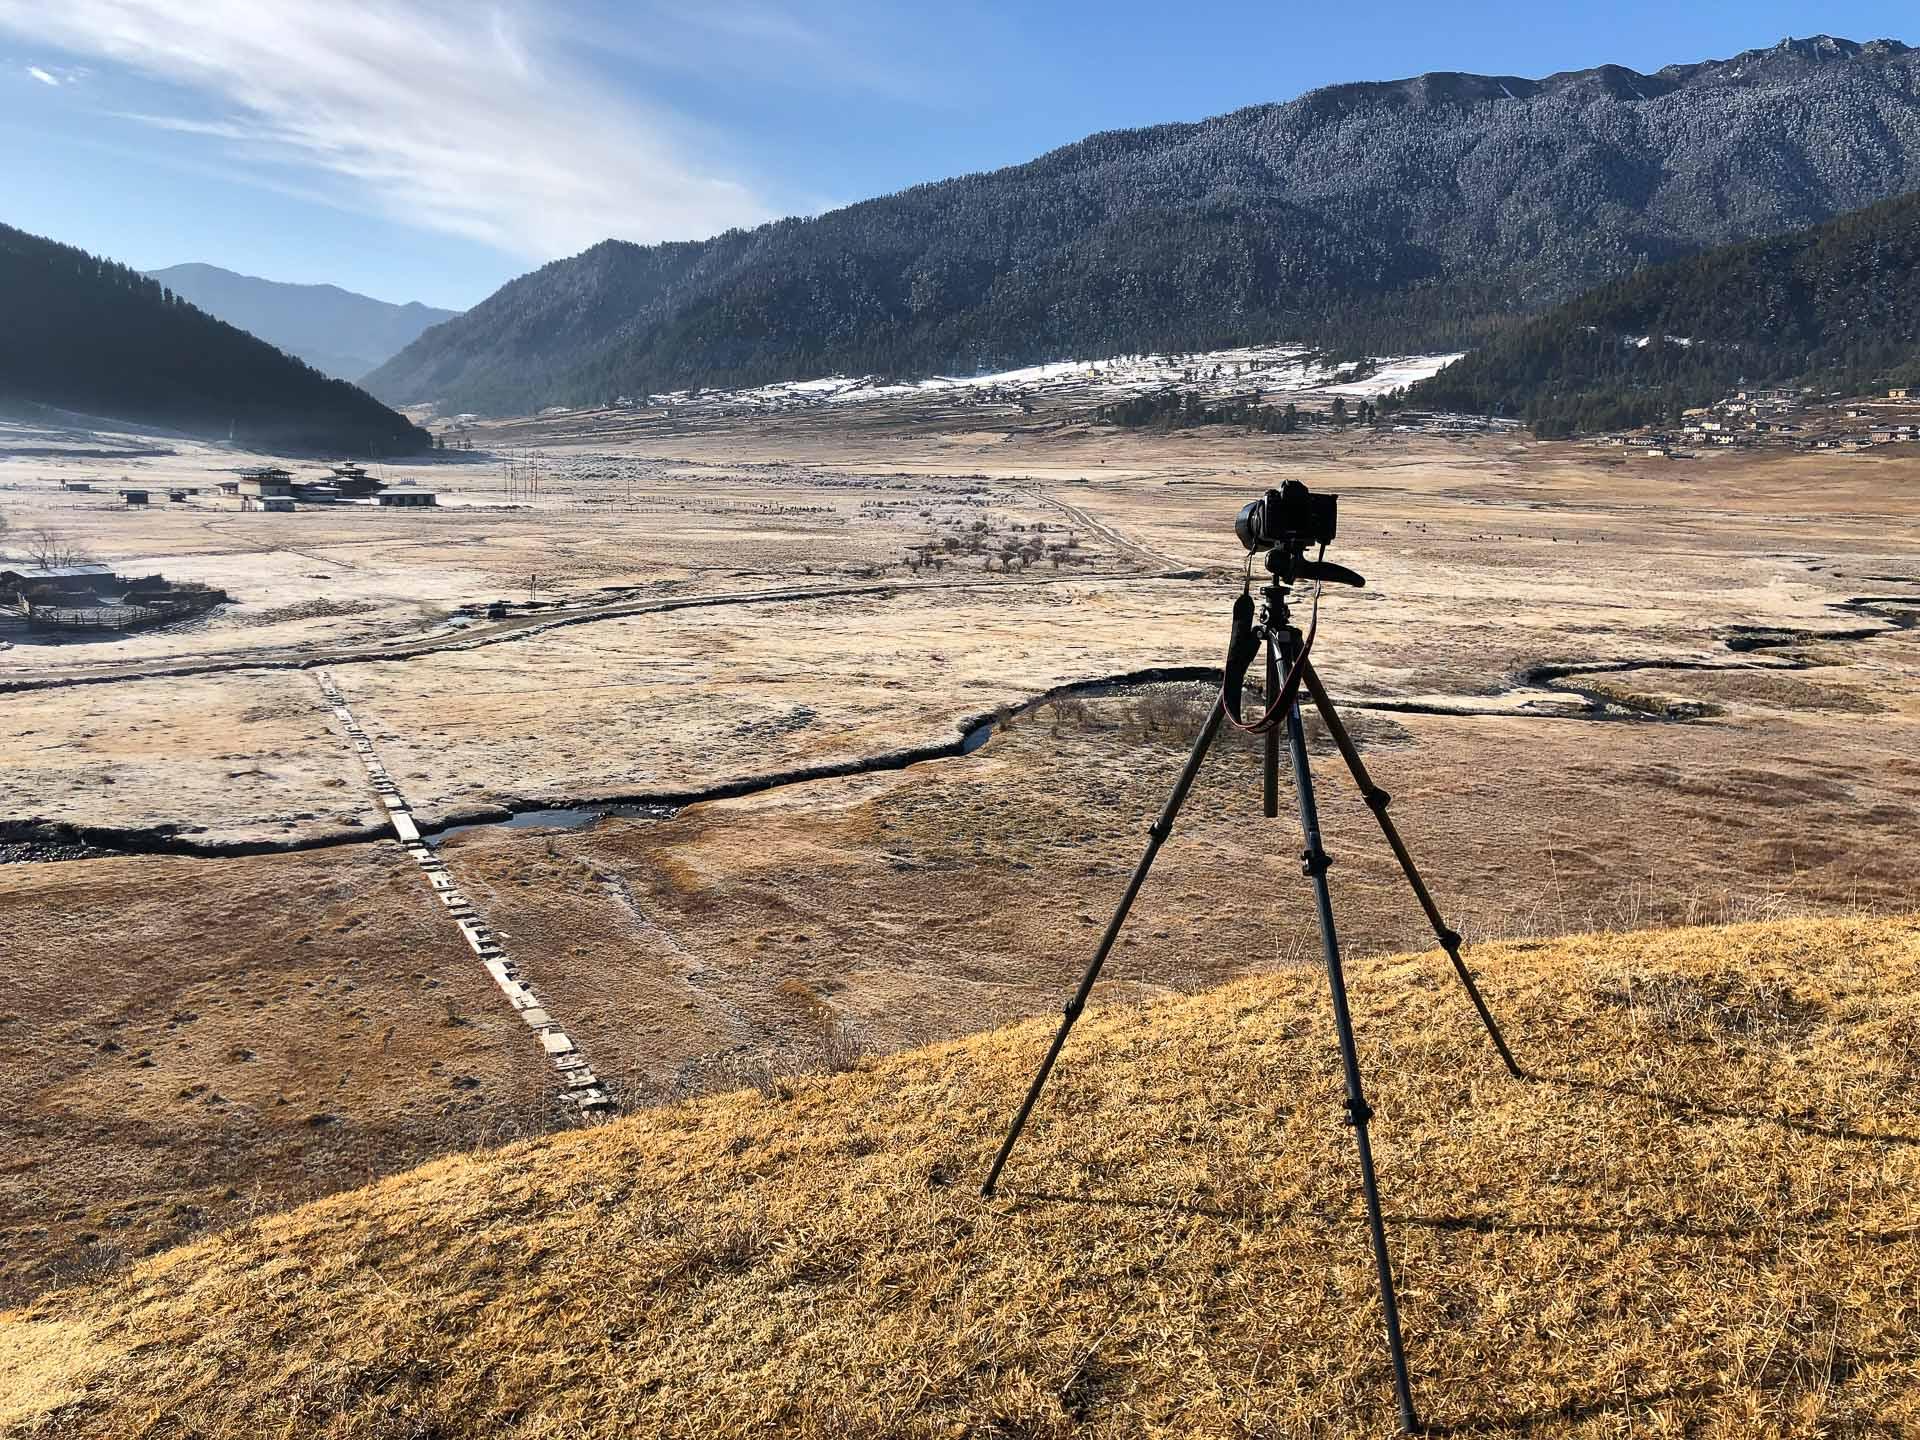 Camera on a tripod overlooking a vast landscape